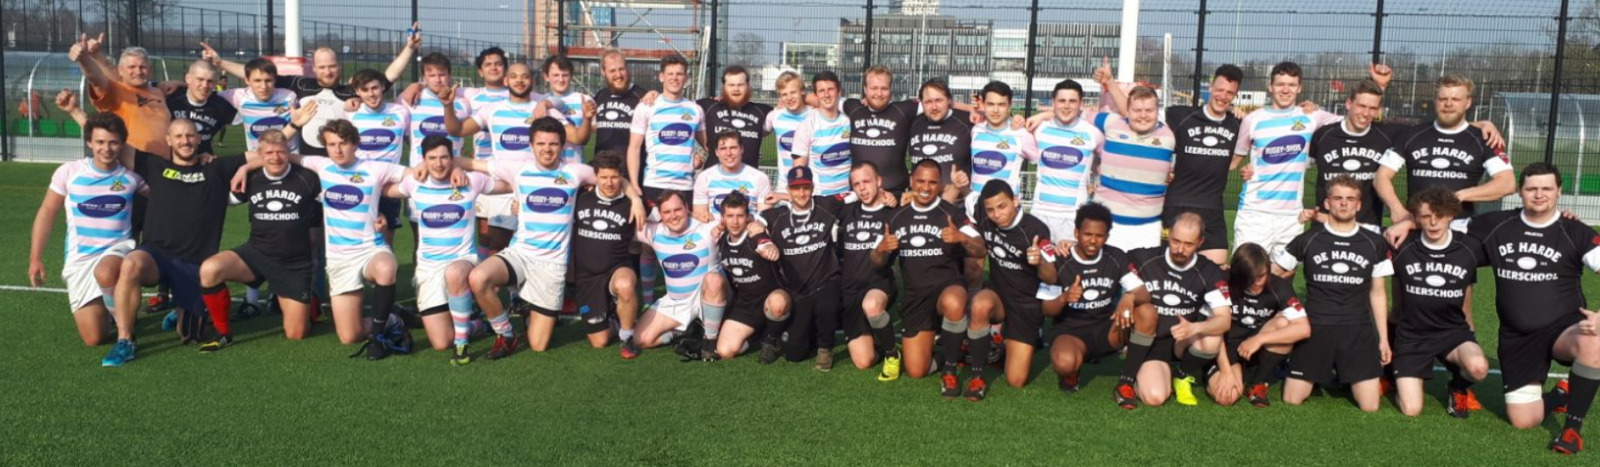 groninger studenten rugby club harde leerschool